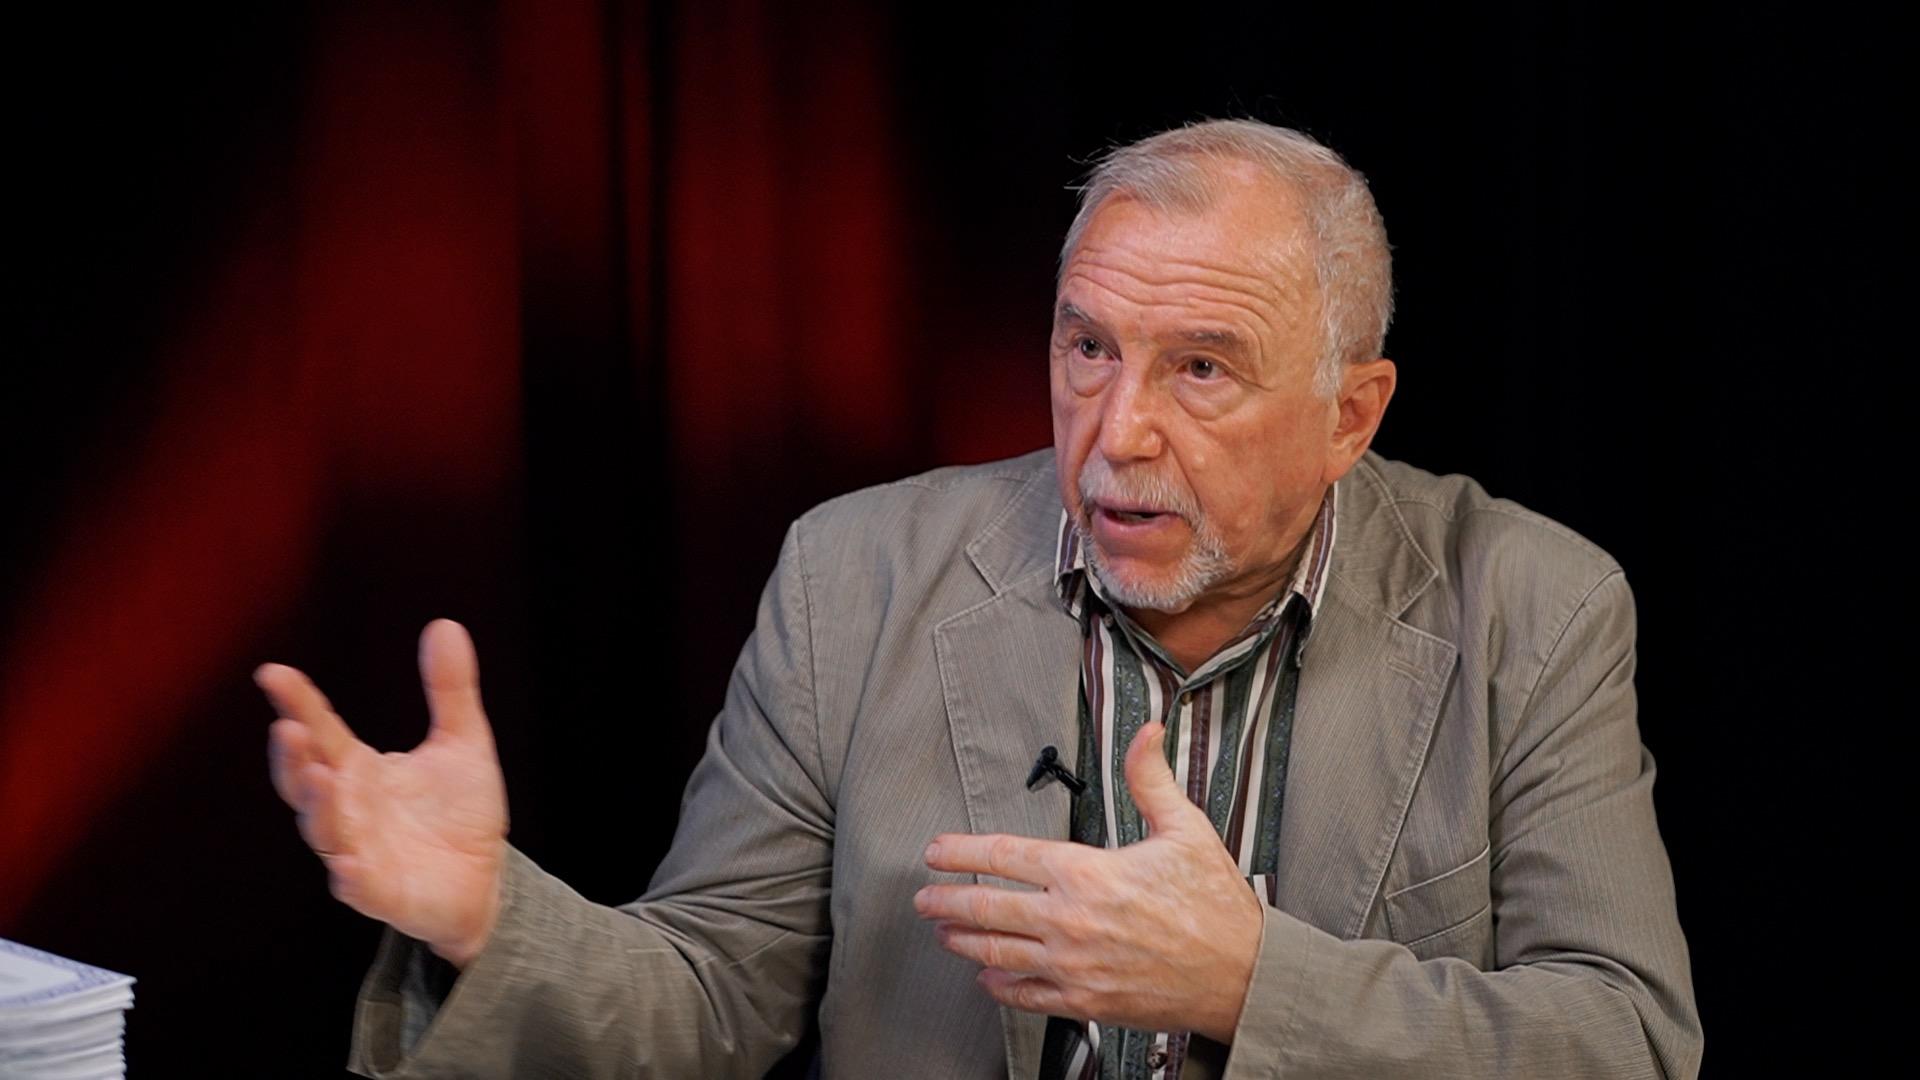 Veidemann intervjuus Objektiivile: probleemi ERRi poliitilise tasakaalustatusega ma ei näe